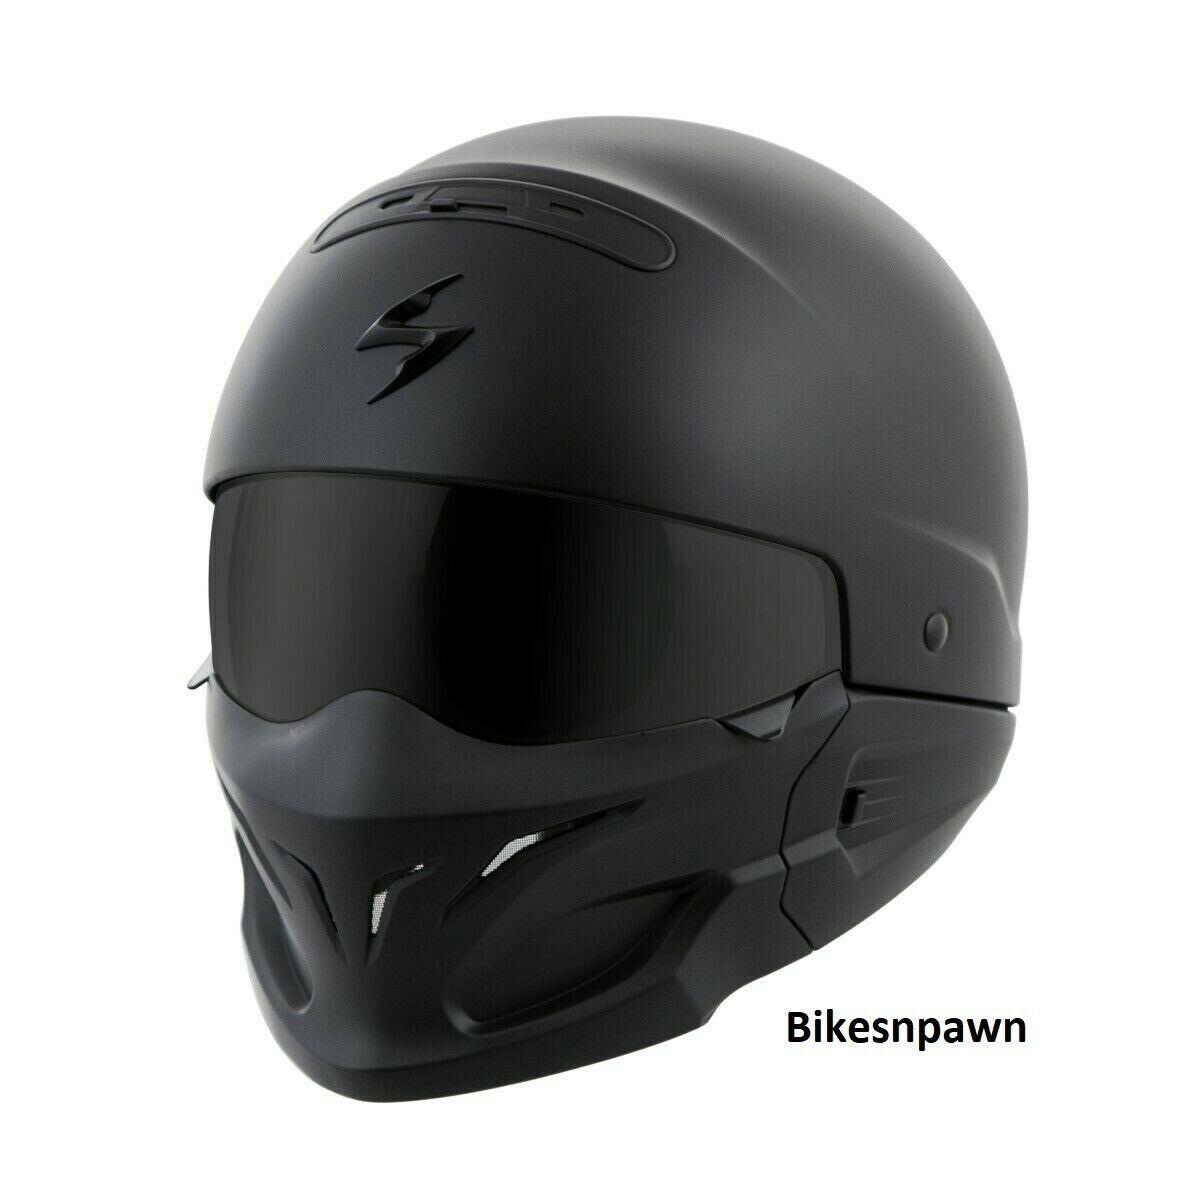 New Size XS Scorpion EXO Covert Matt Black 3 in 1 Motorcycle Helmet DOT